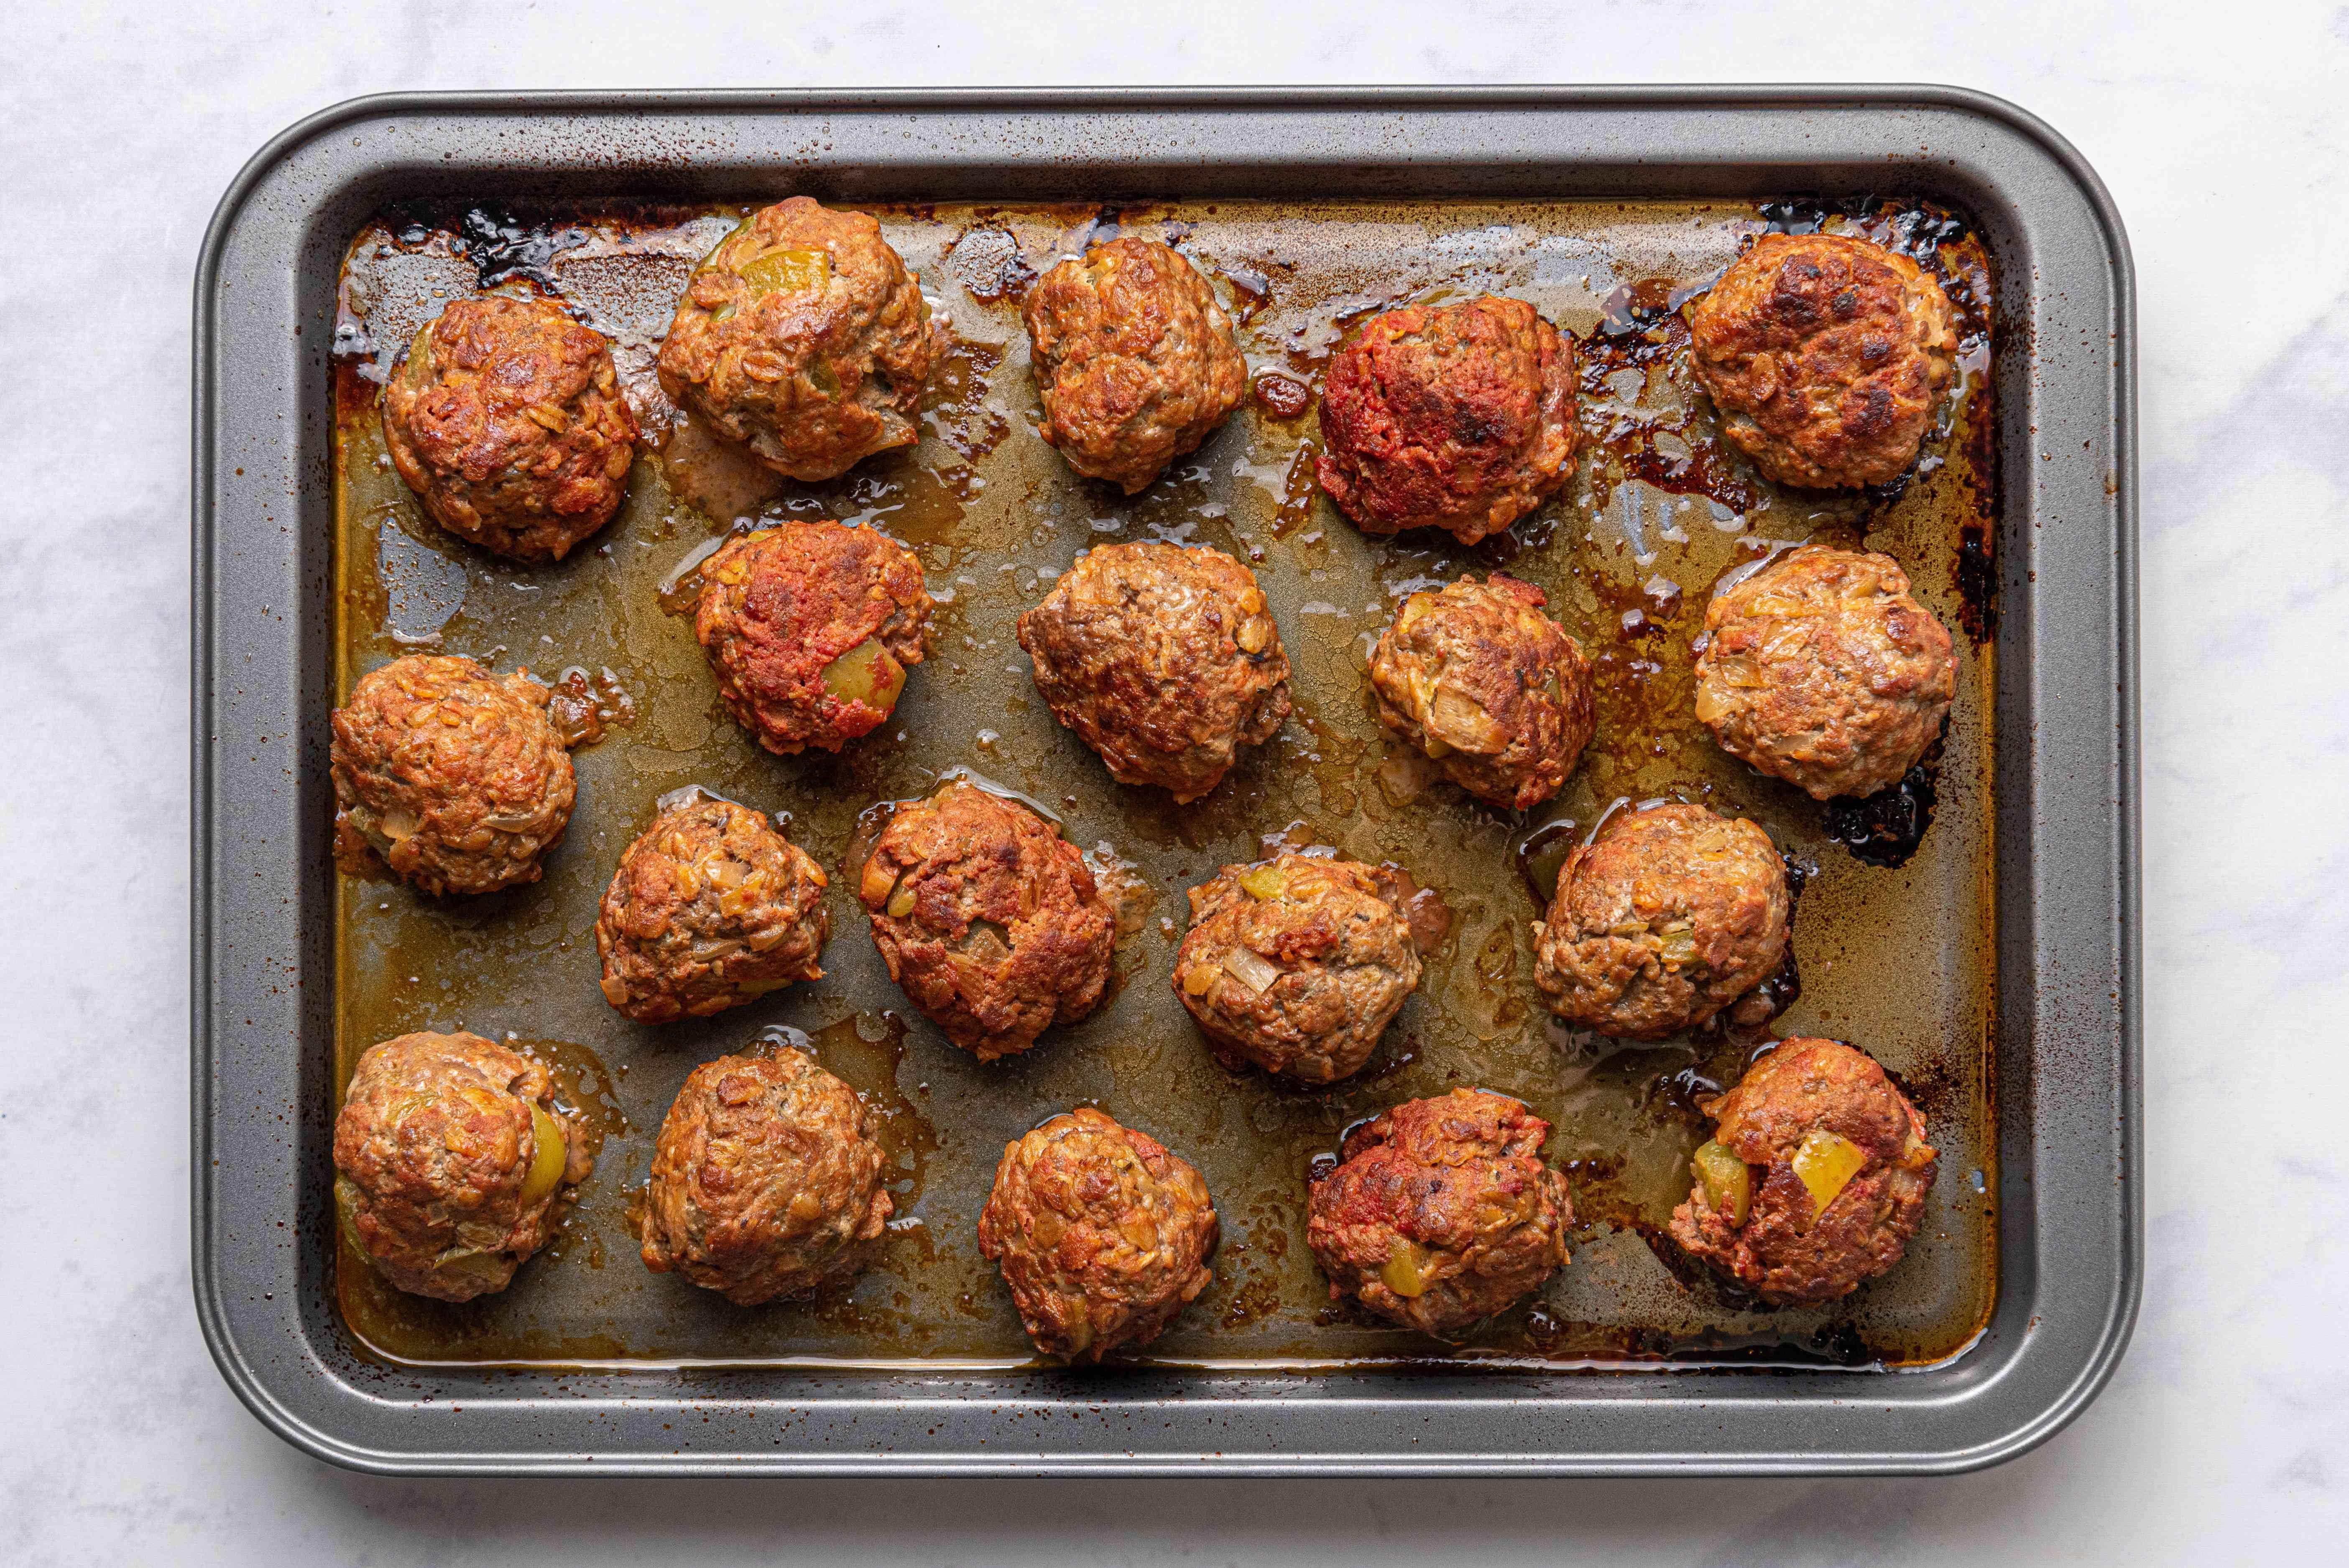 baked meatballs on a baking sheet